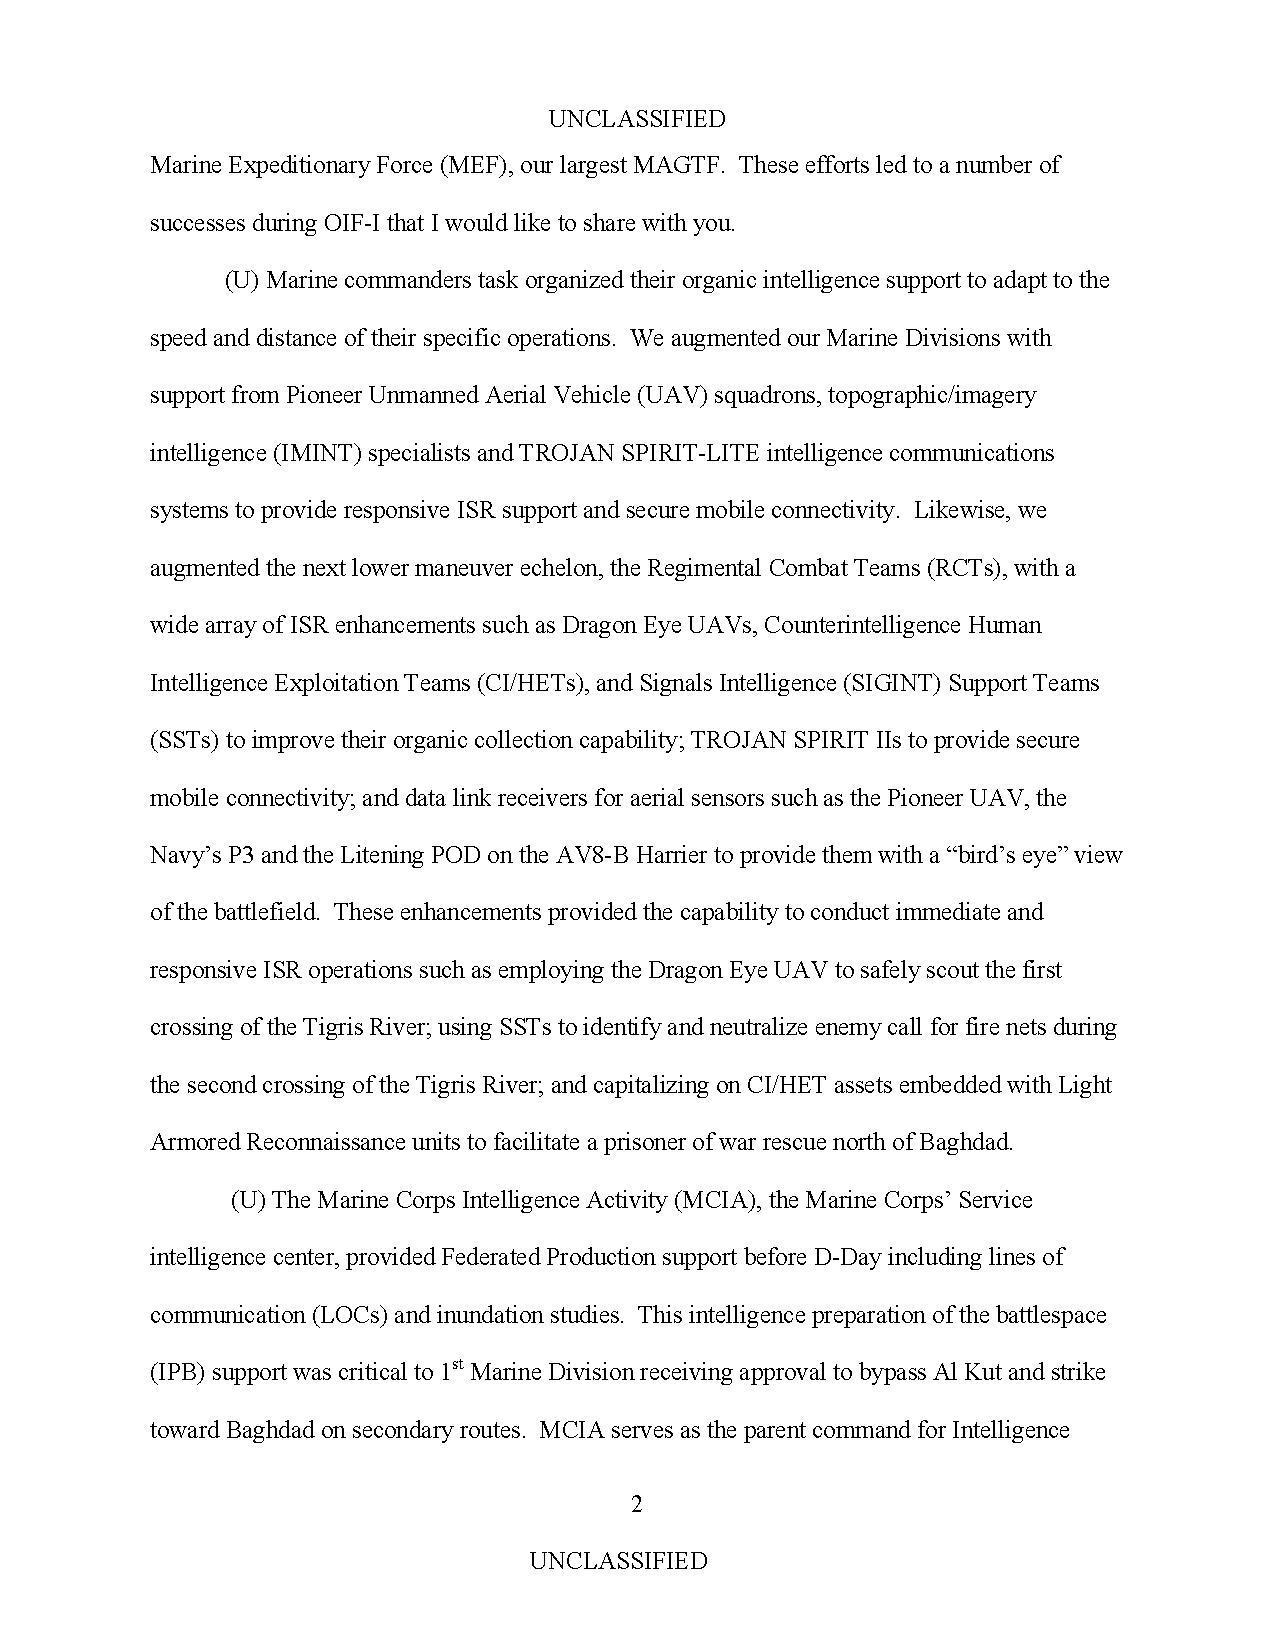 Page:SASC Iraq OIF Decker April 2004 pdf/3 - Wikisource, the